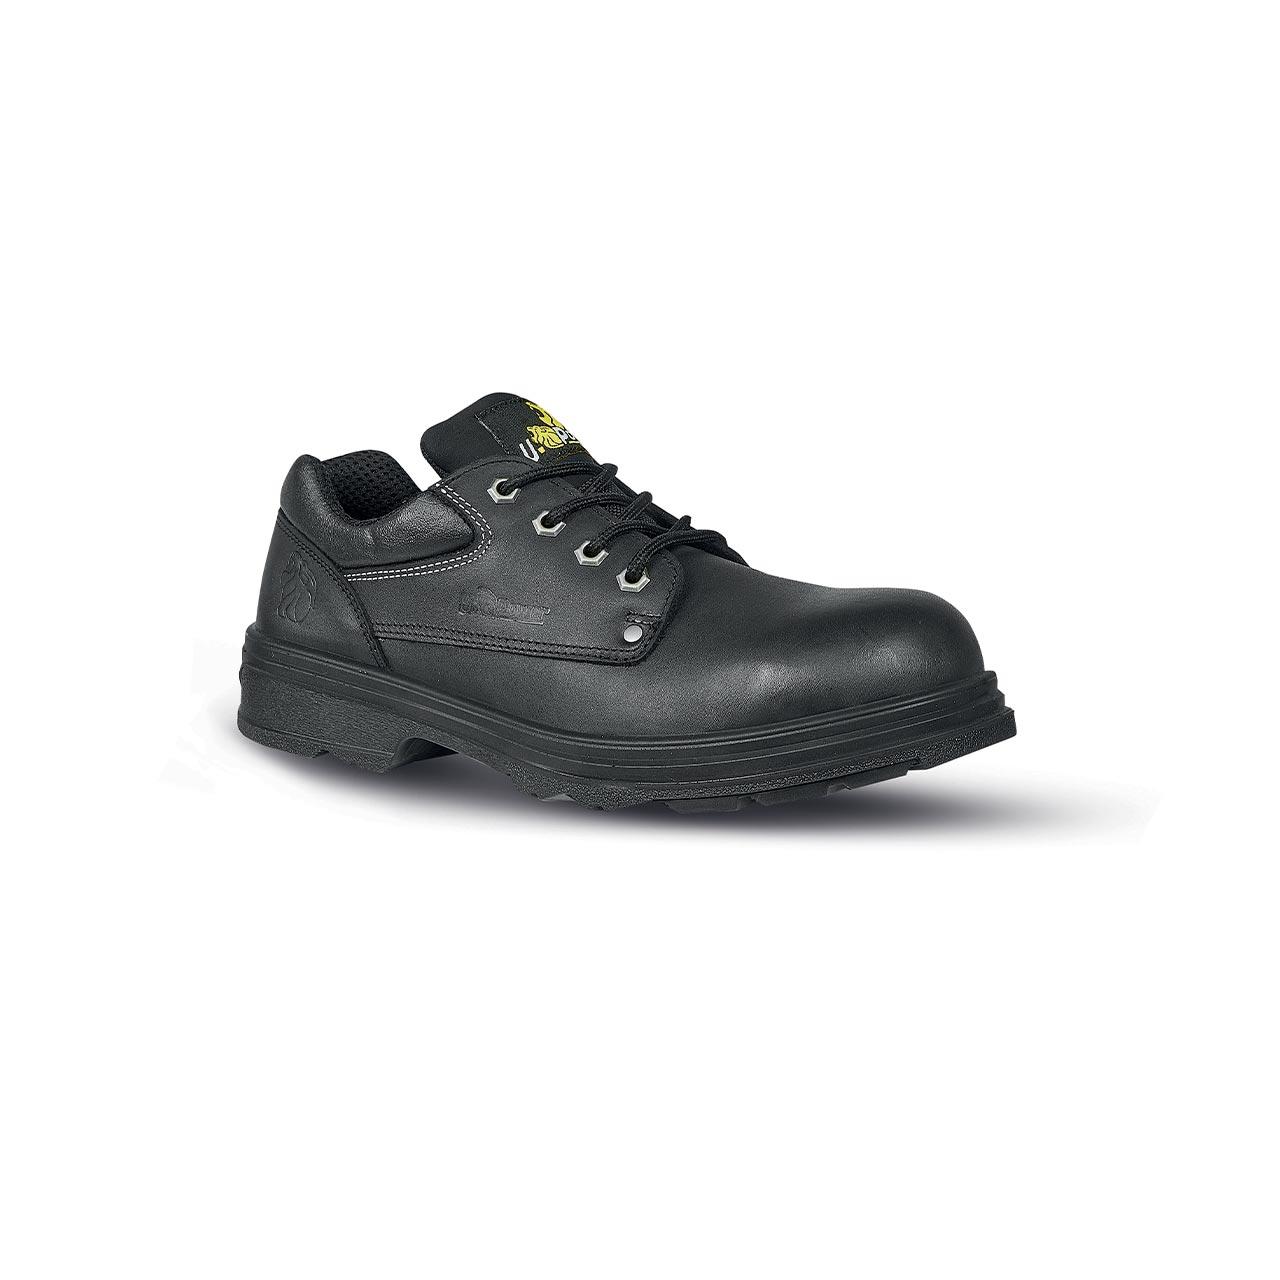 scarpa antinfortunistica upower modello mustang linea conceptm vista laterale